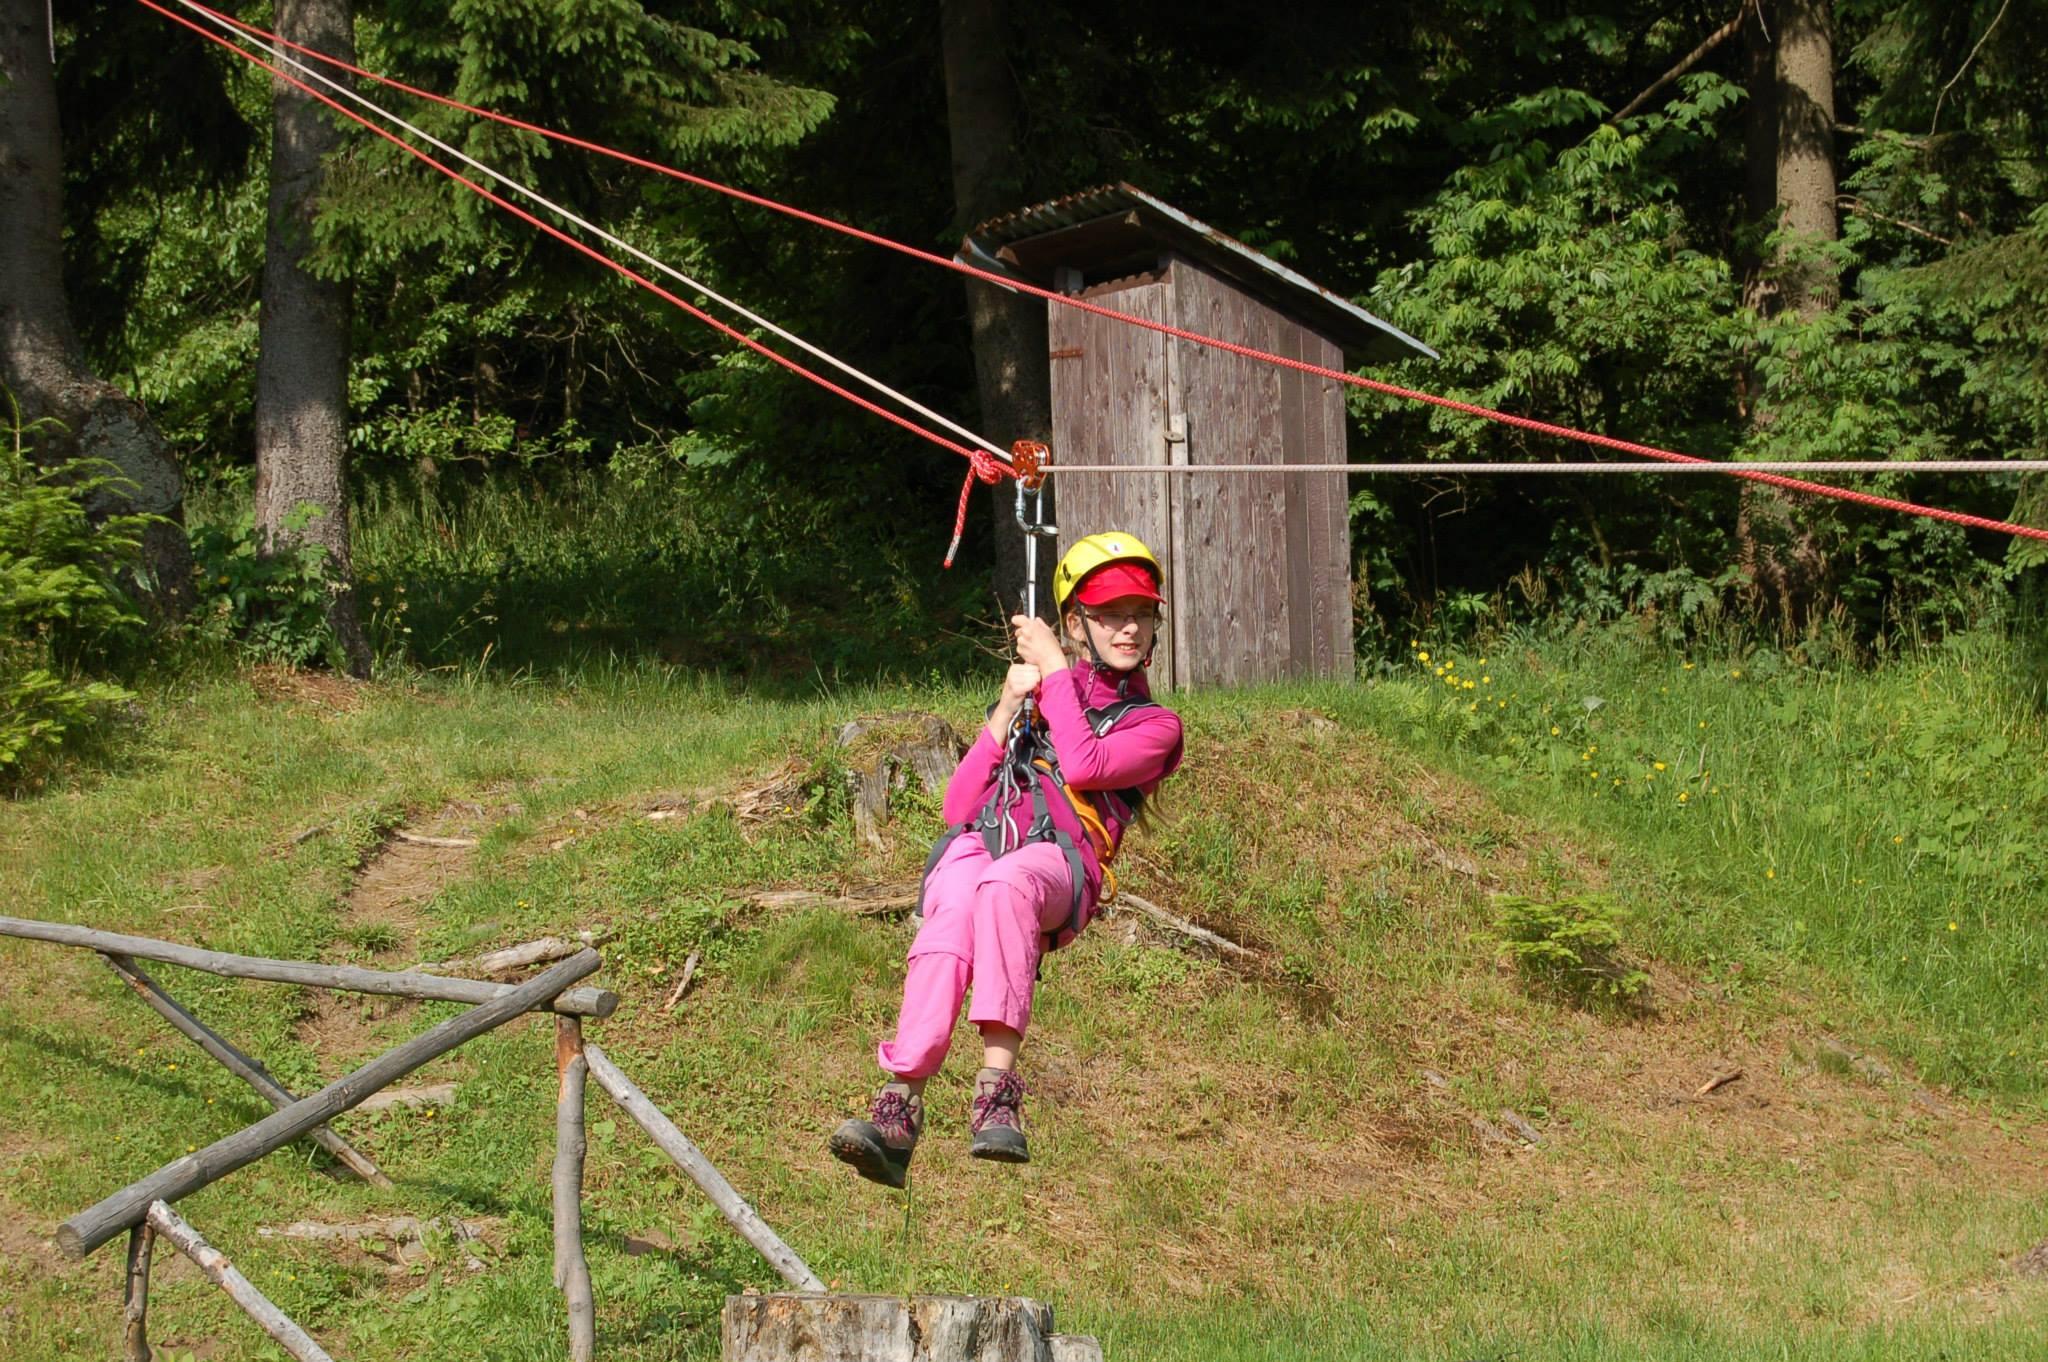 Horská služba Kremnické vrchy deťom…